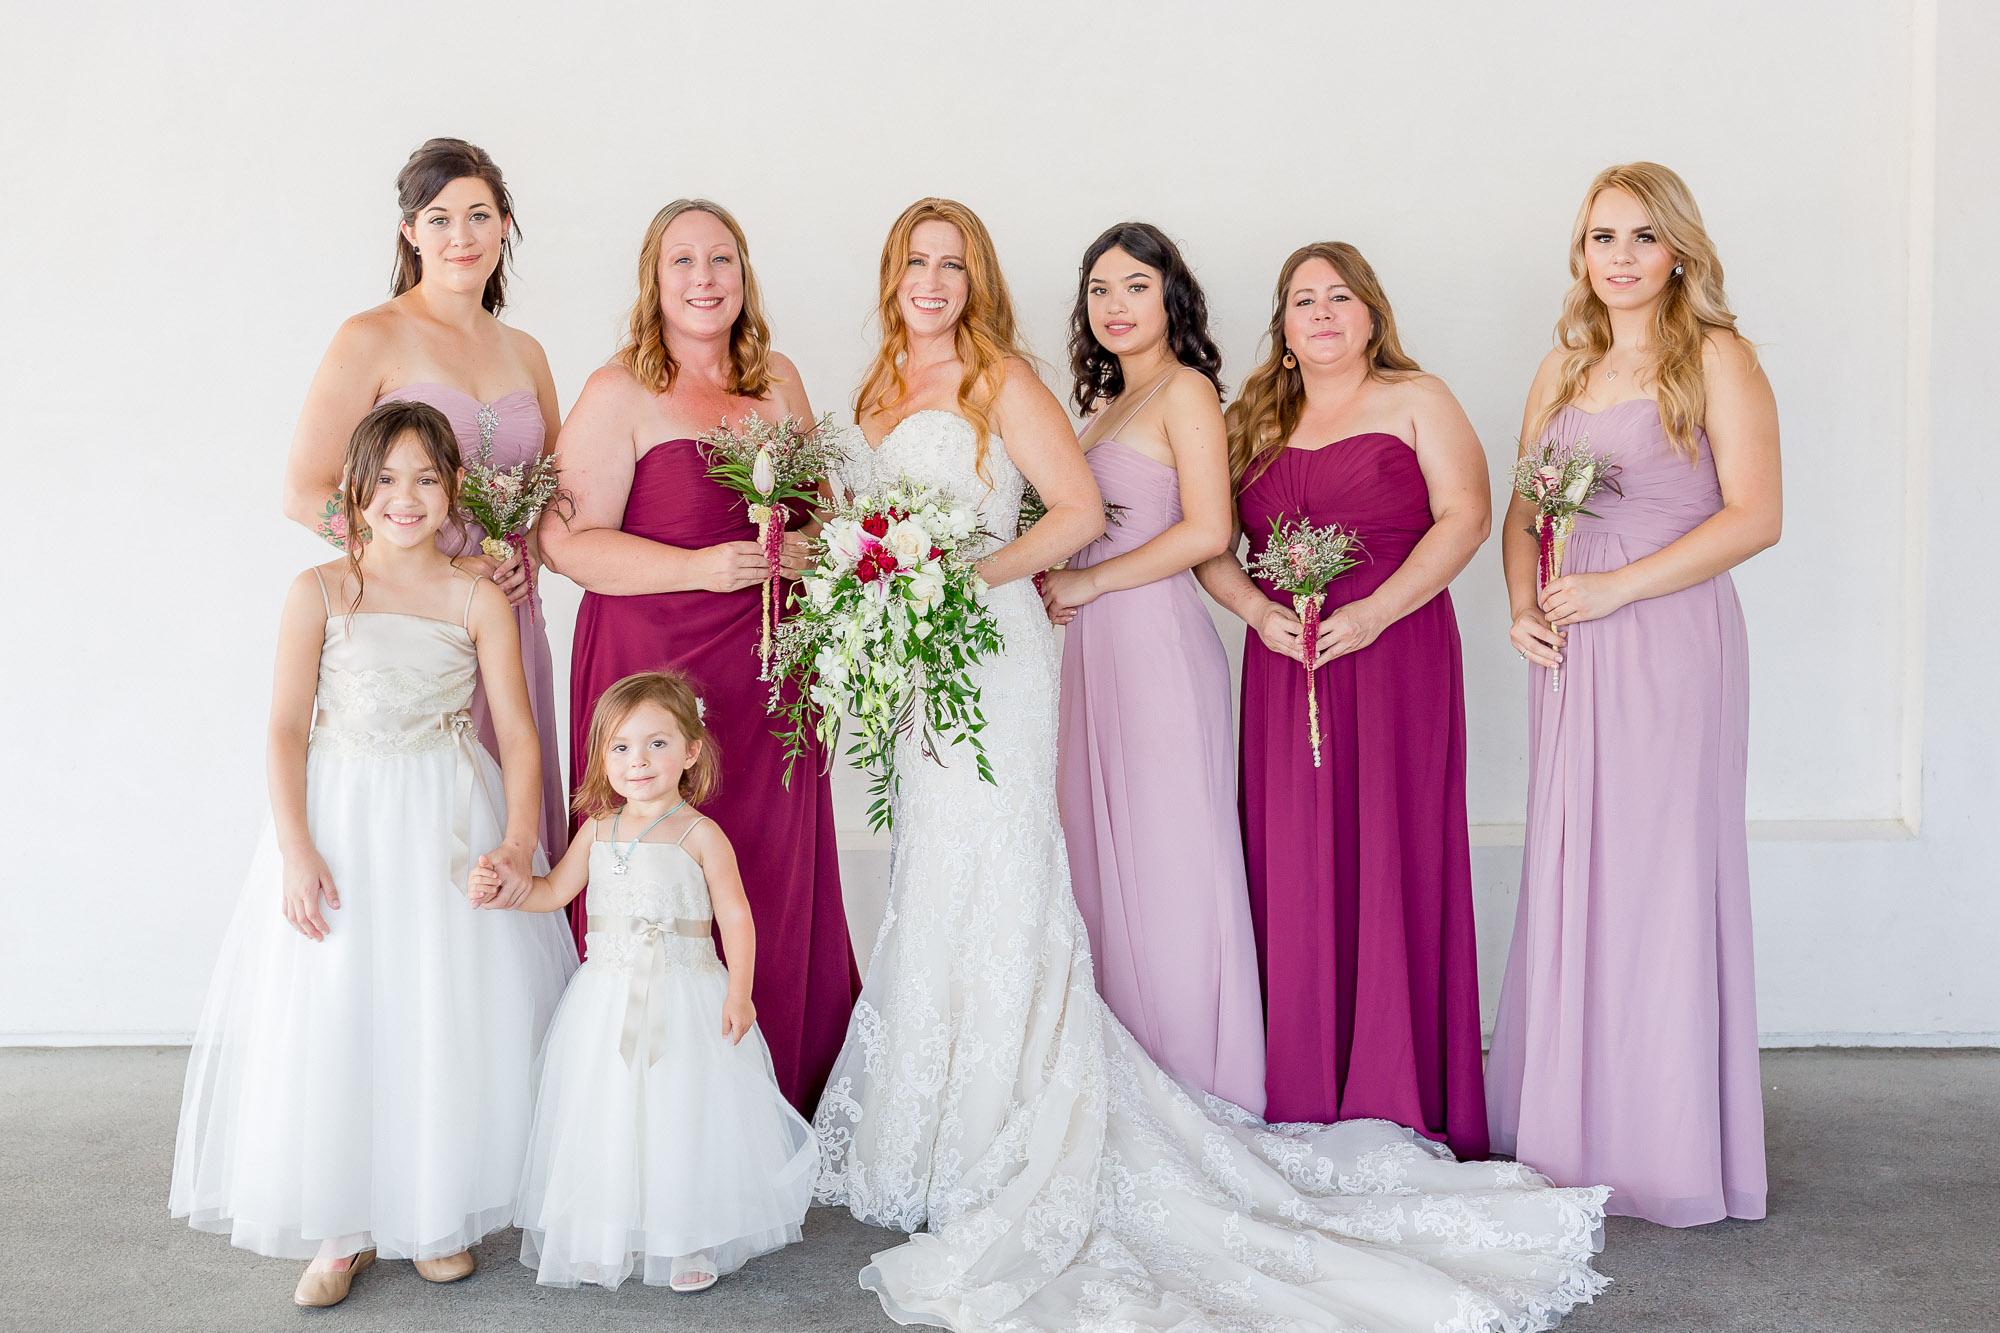 Heather_Pat_San_Marcos_Lakehouse_Wedding_156.jpg